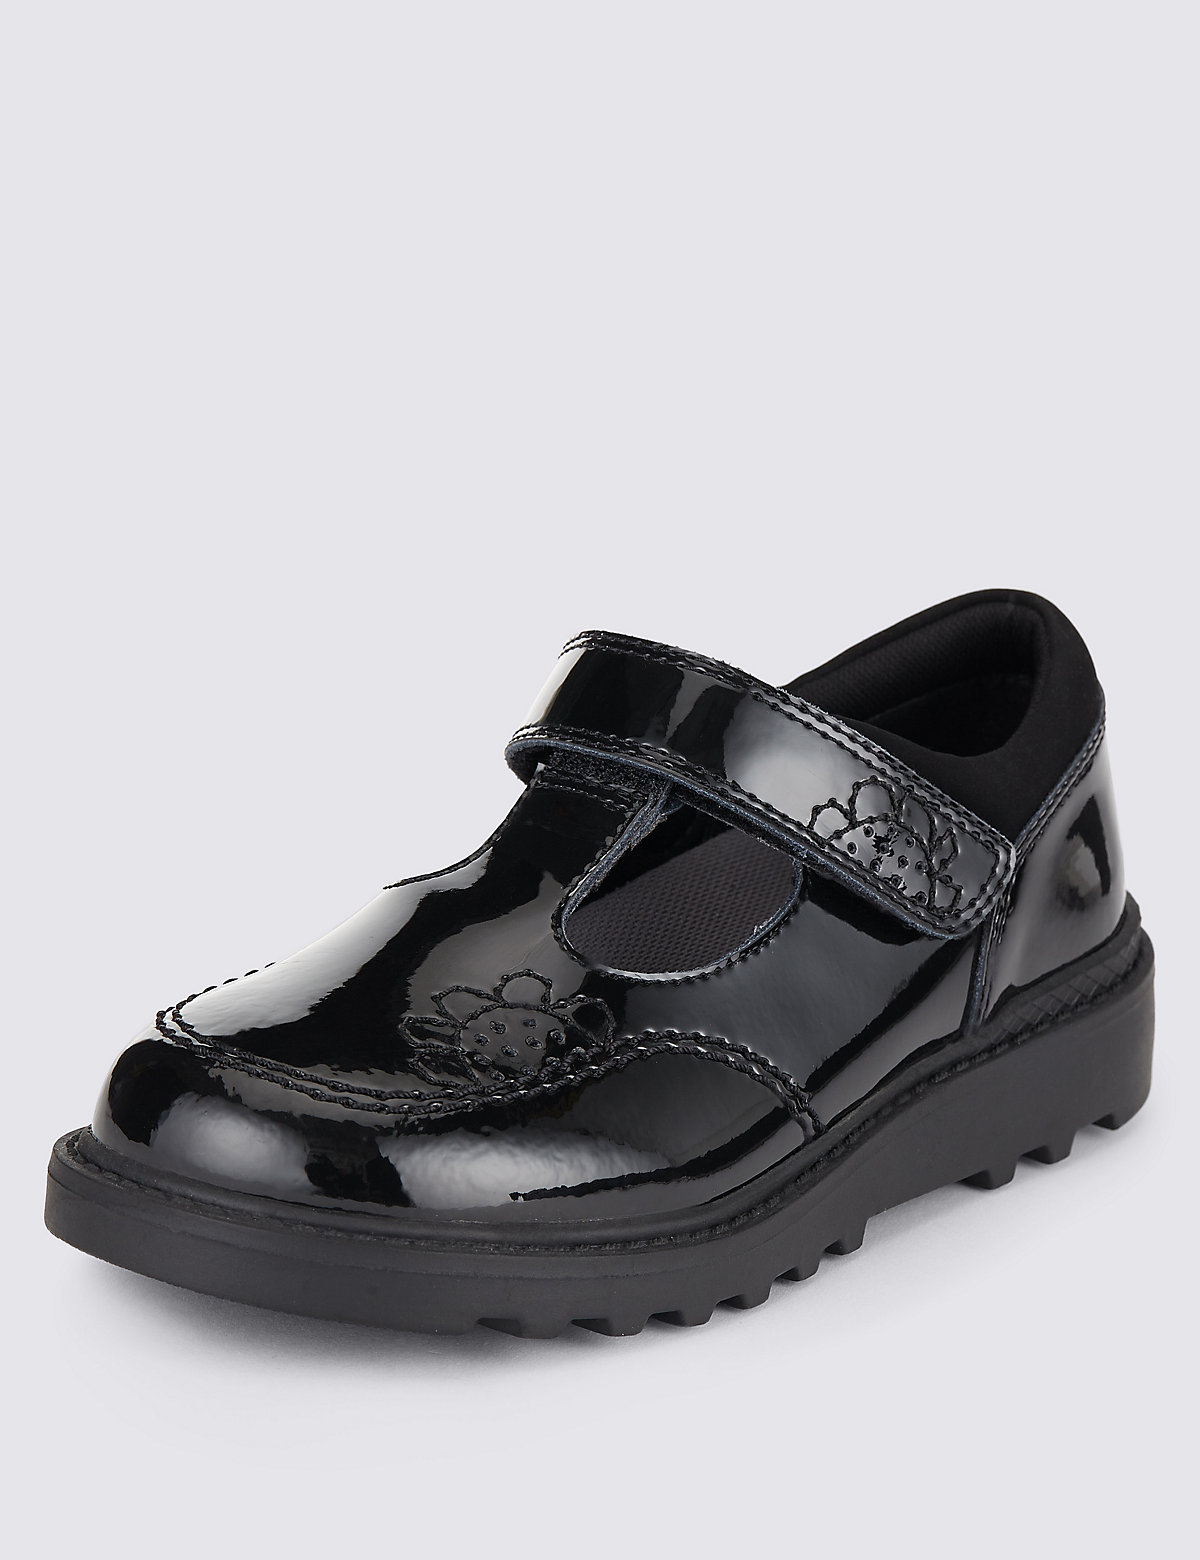 Kids Leather Walkmates Shoes Black